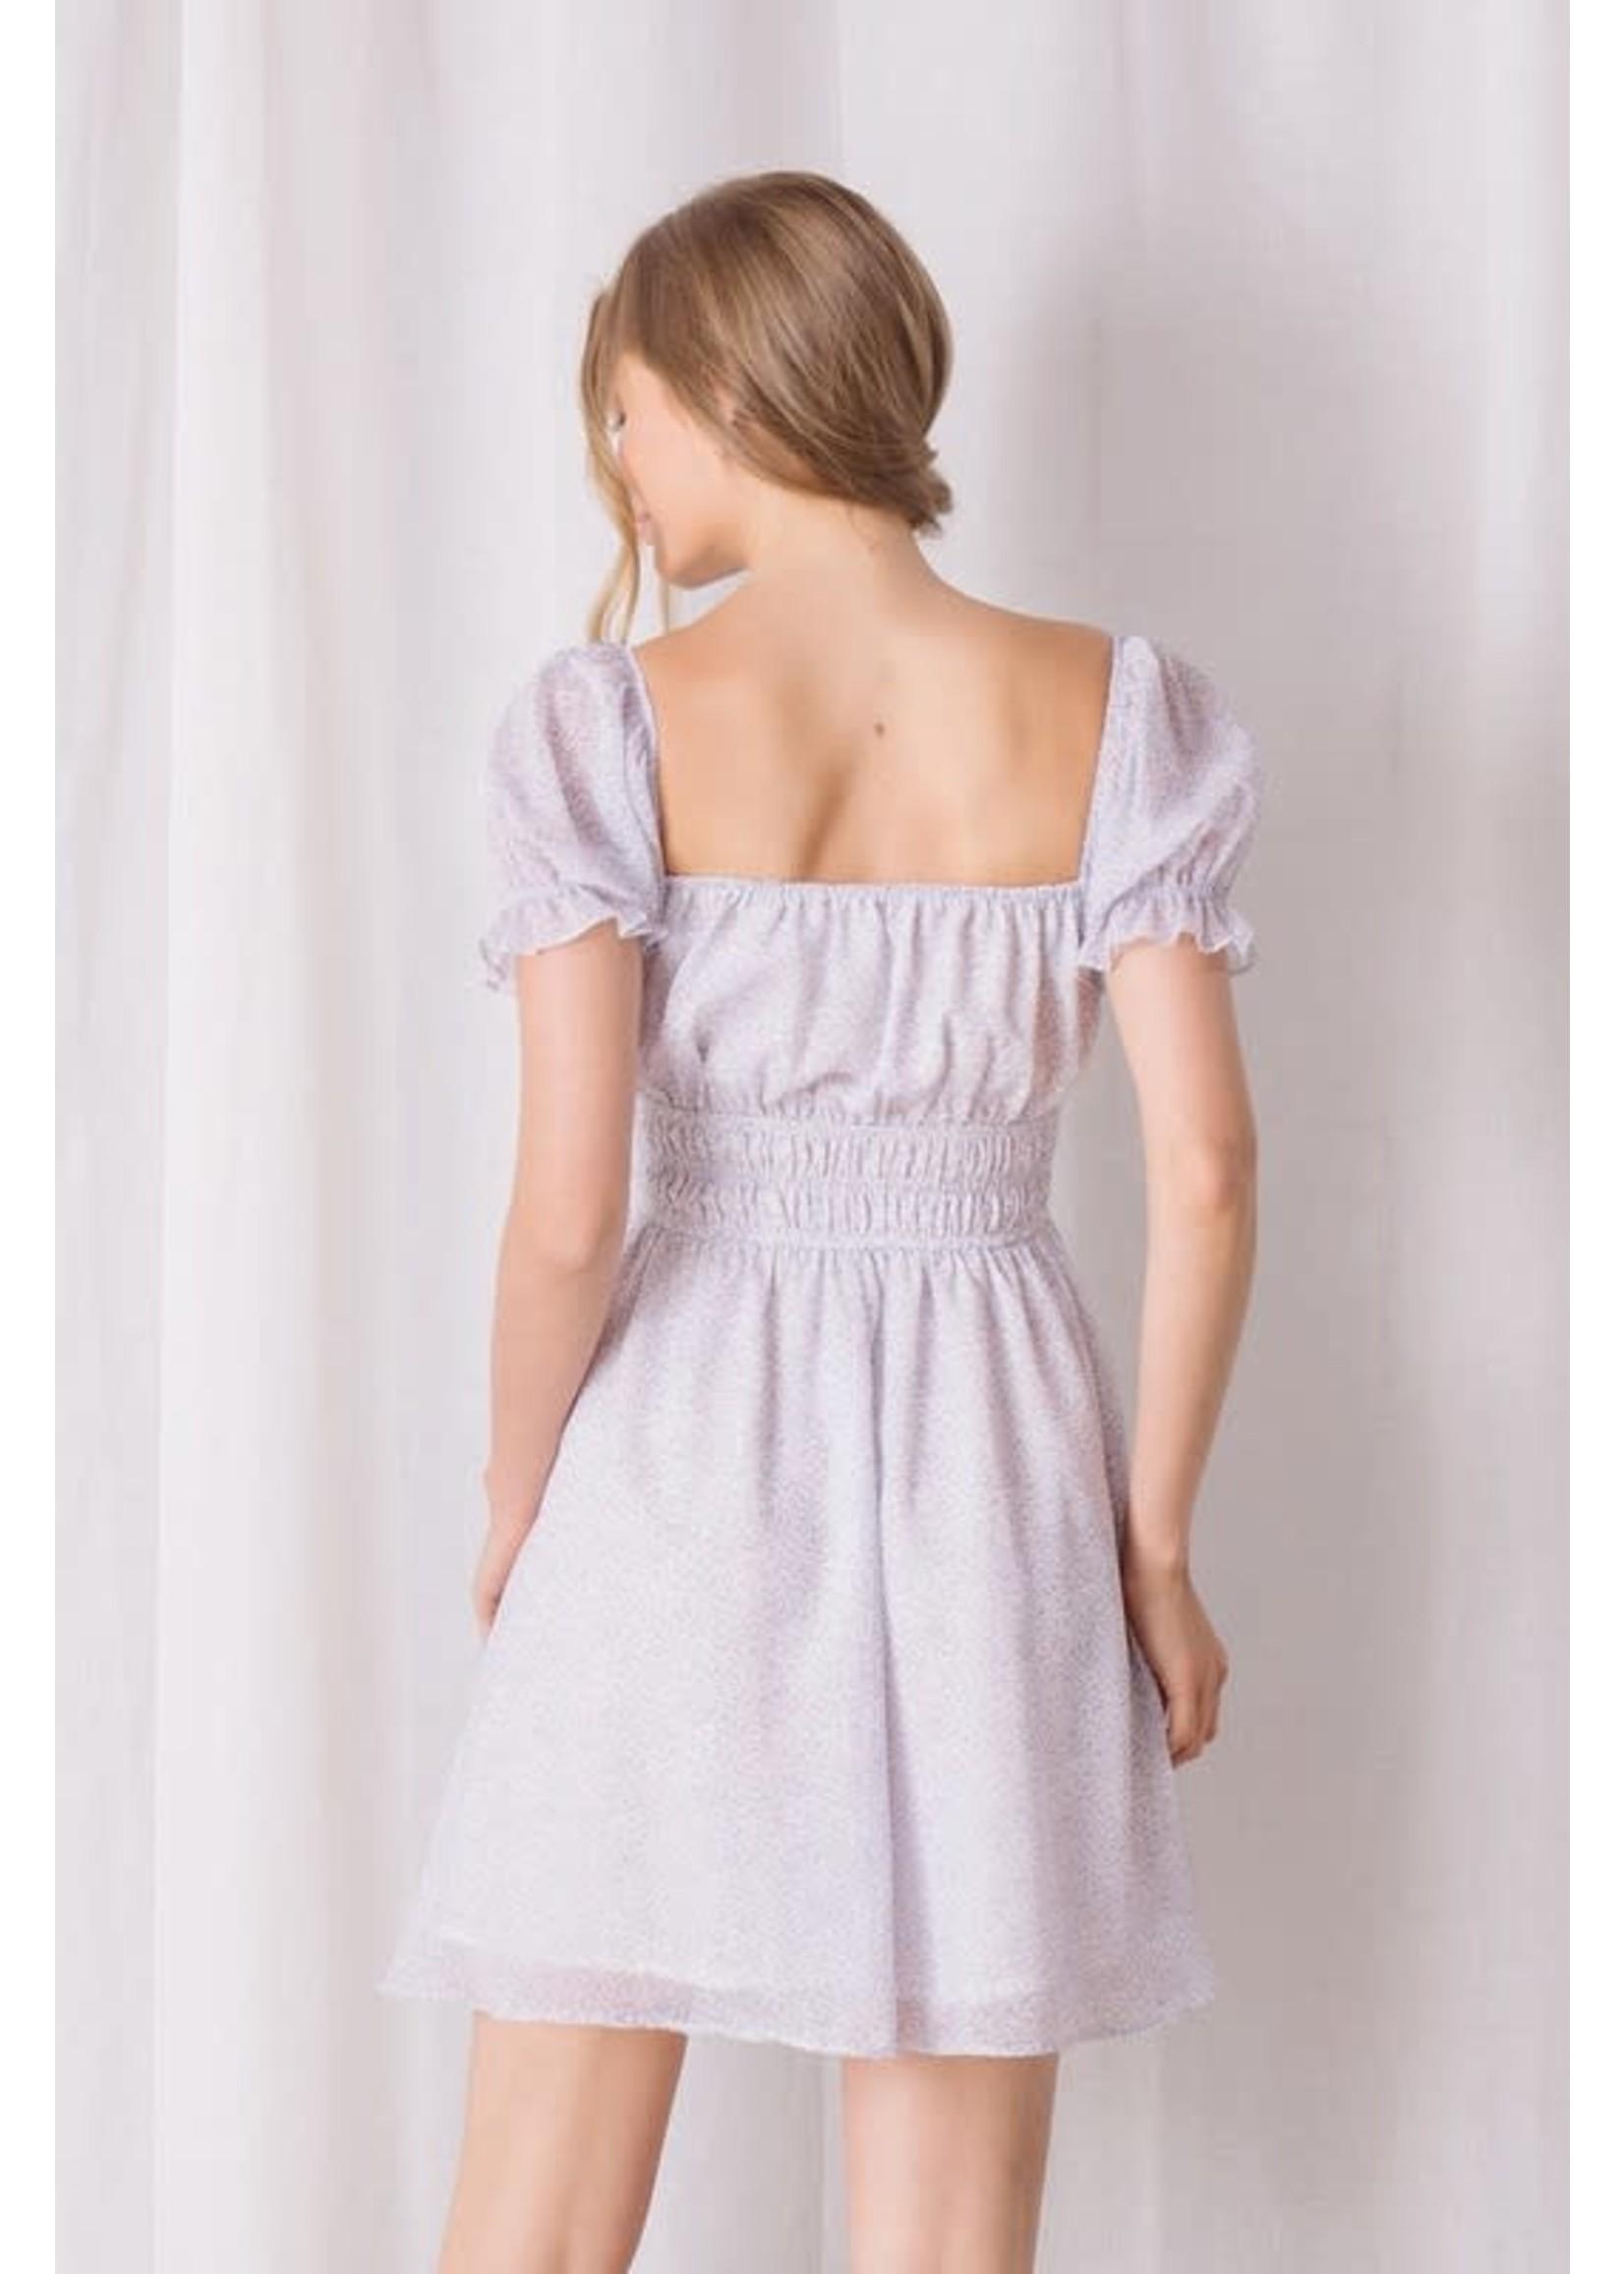 Storia Floral Short Sleeved Mini Dress - JD3314